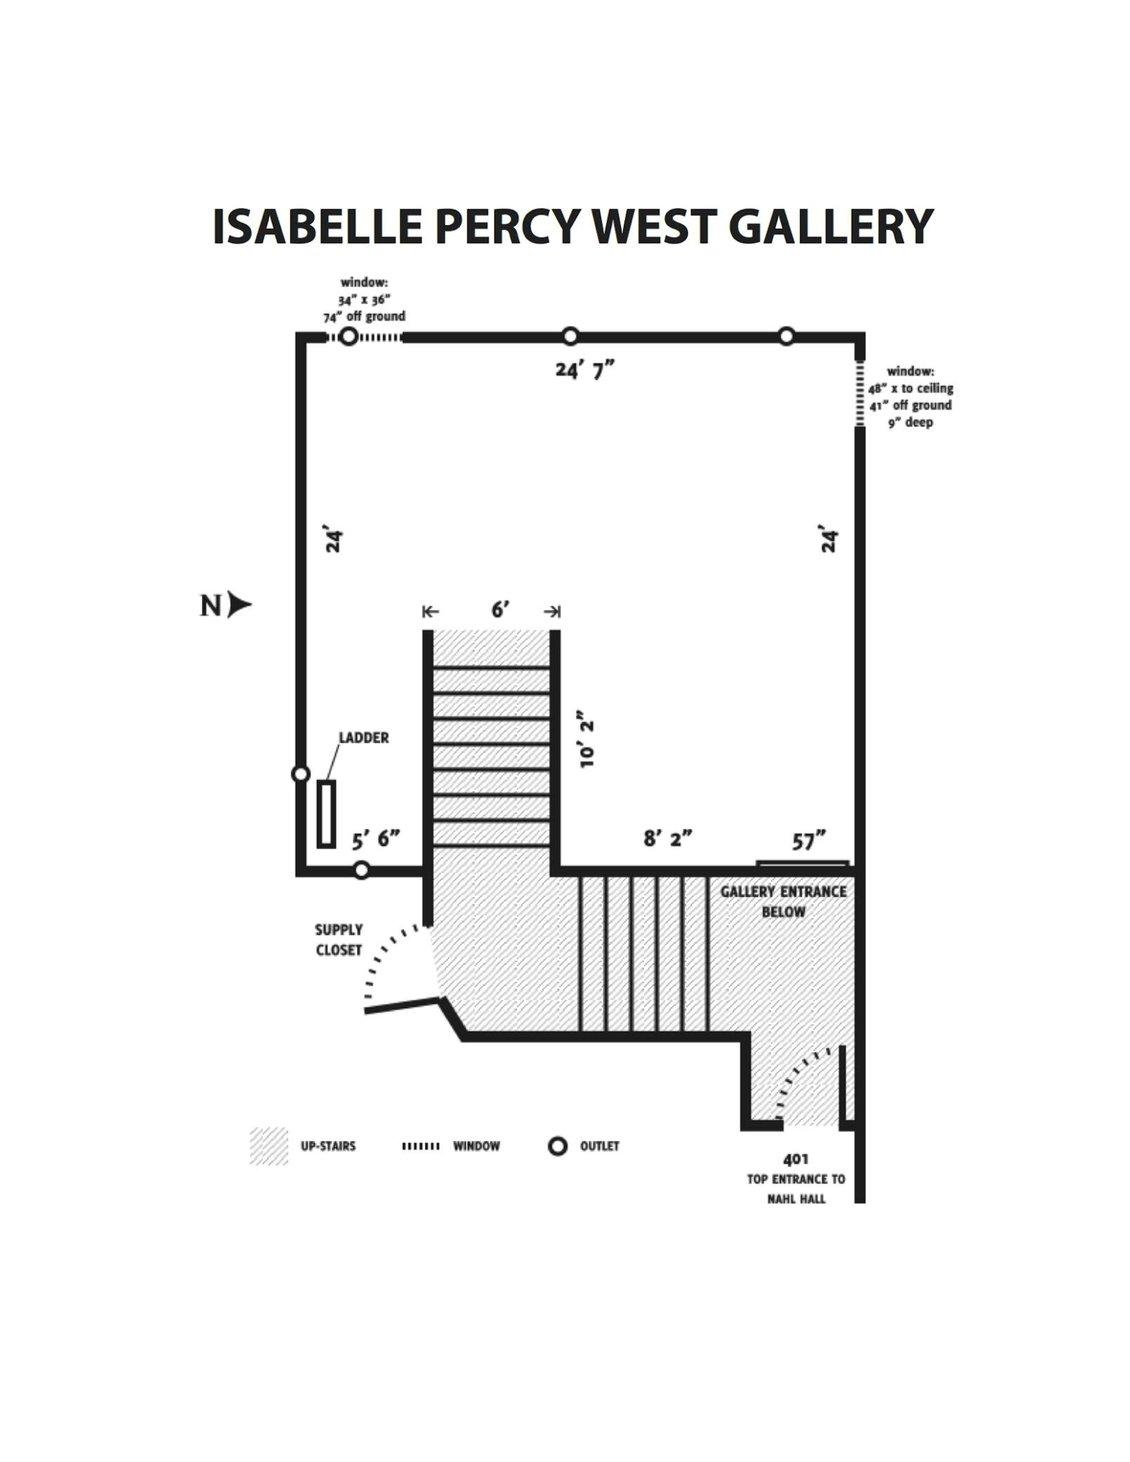 Isabel Percy West Gallery Floorplan